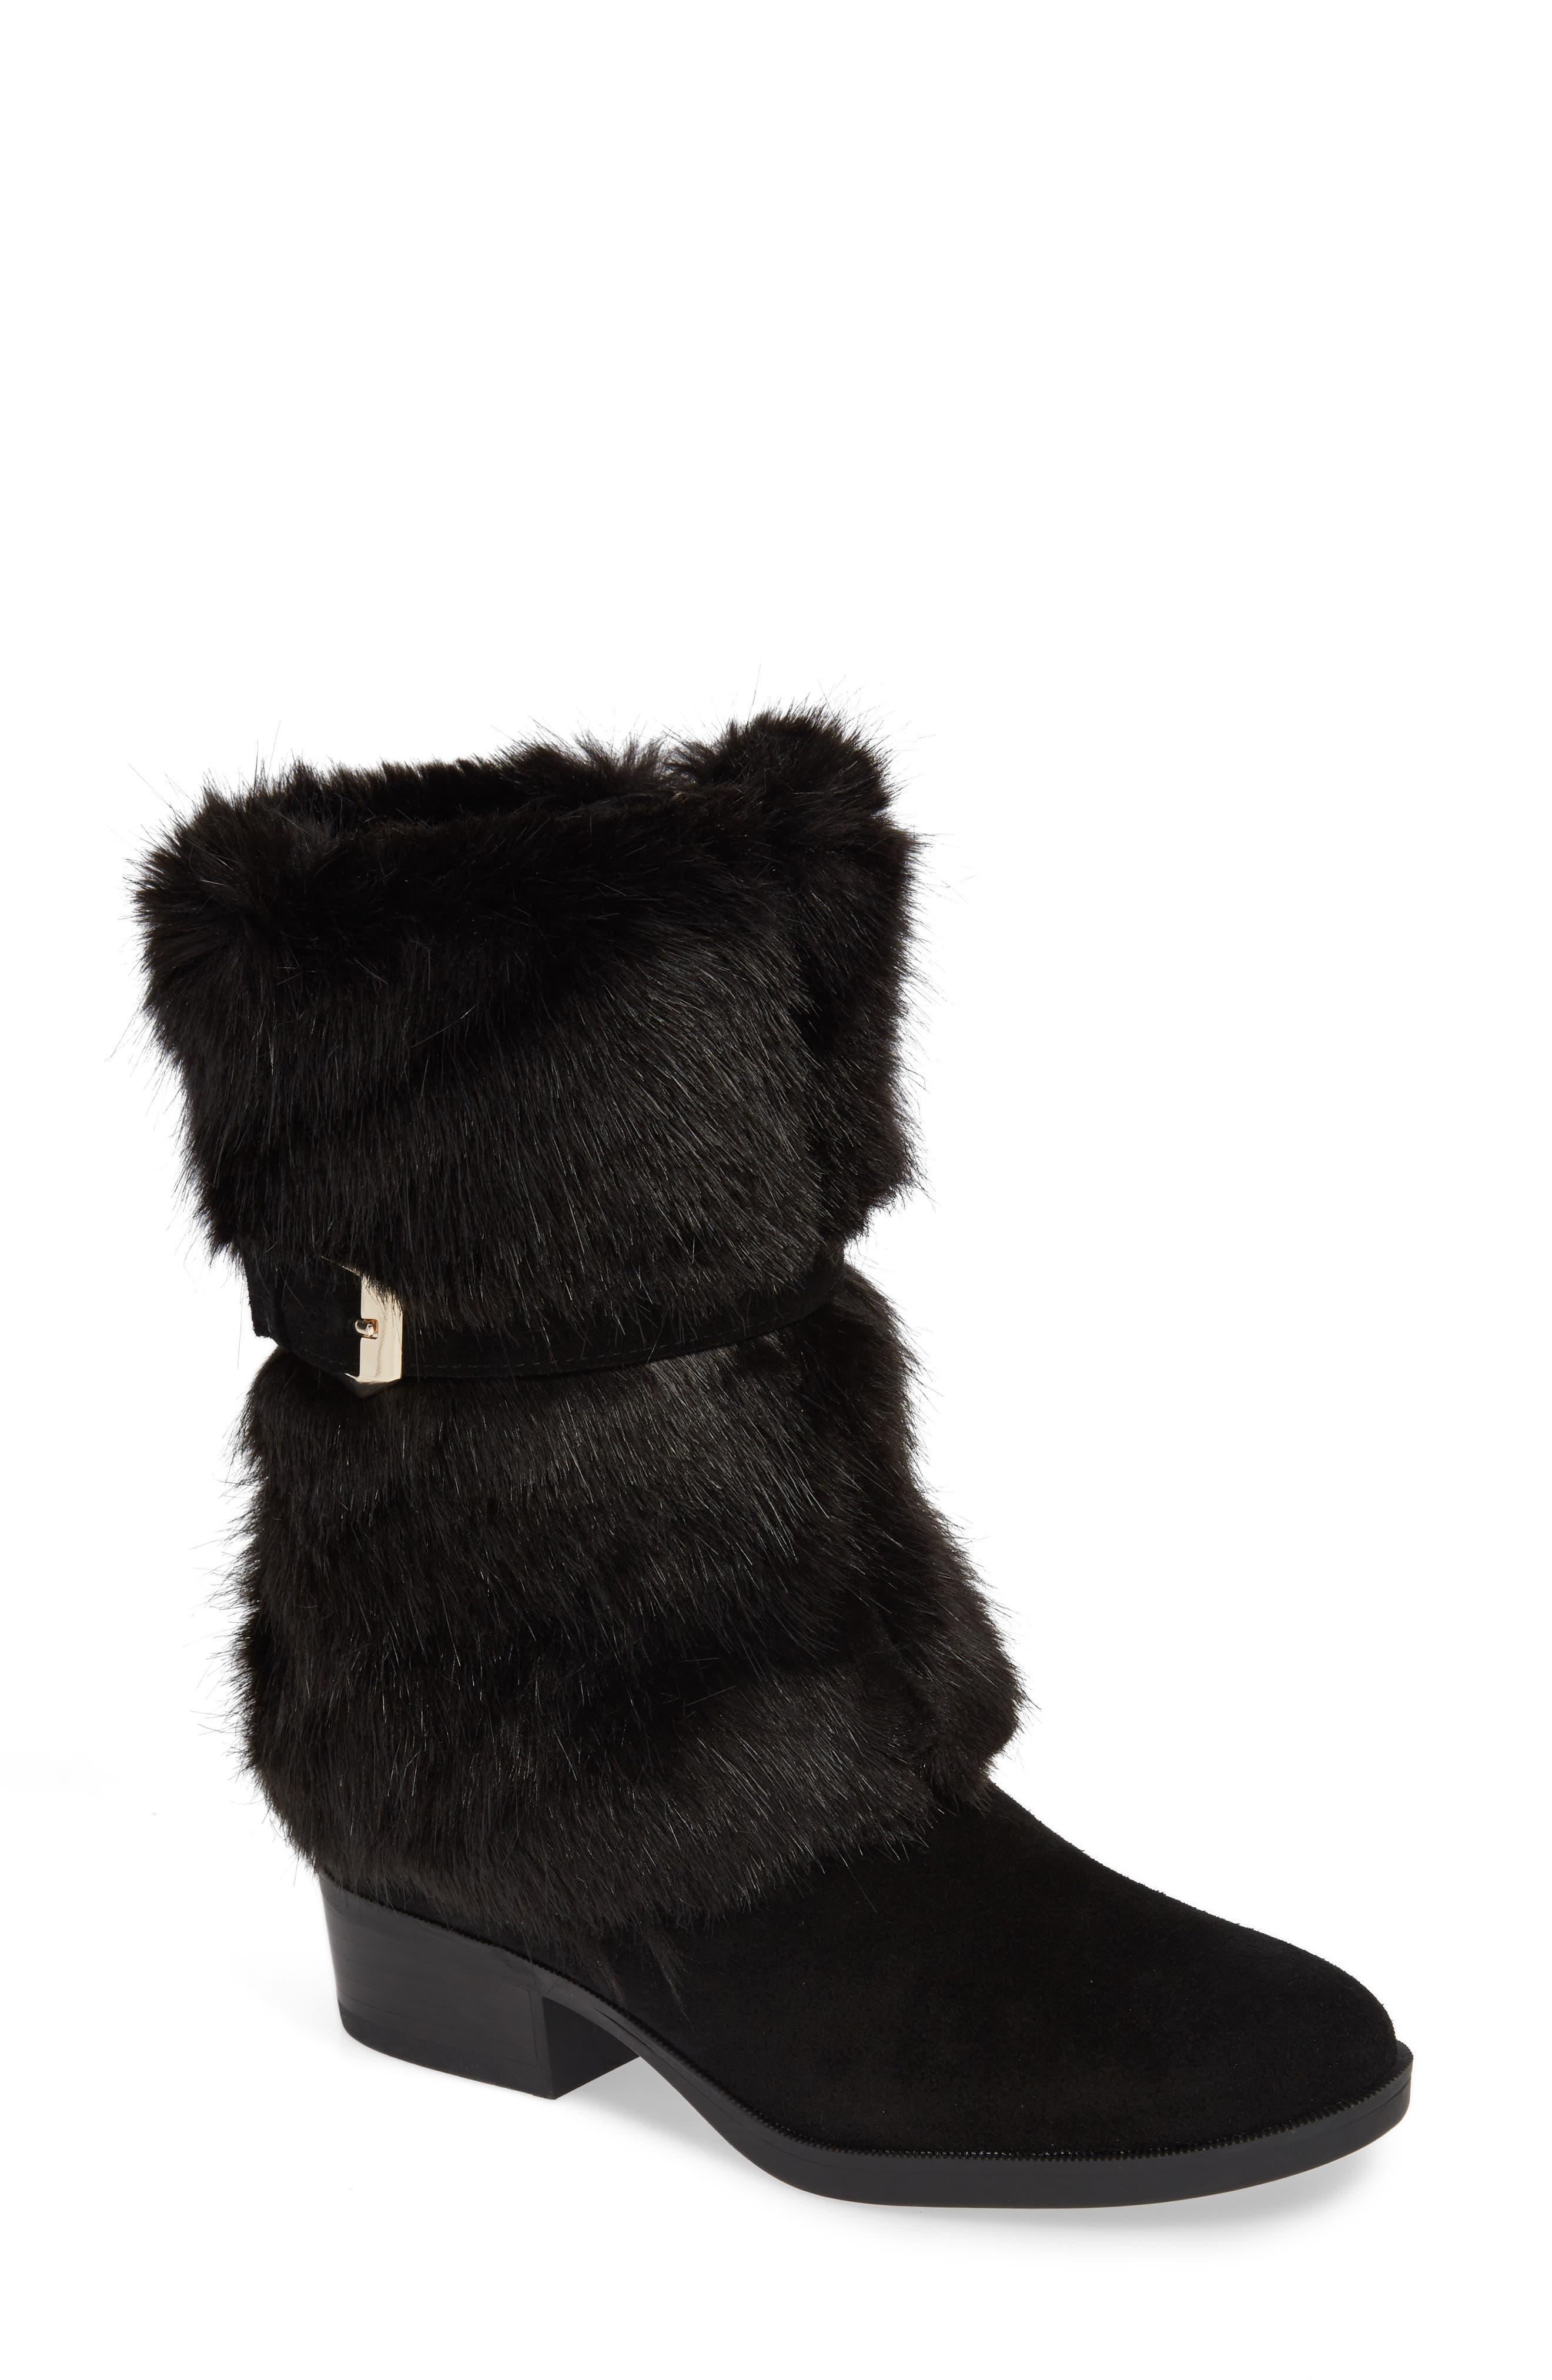 Taryn Rose Giselle Water Resistant Faux Fur Boot